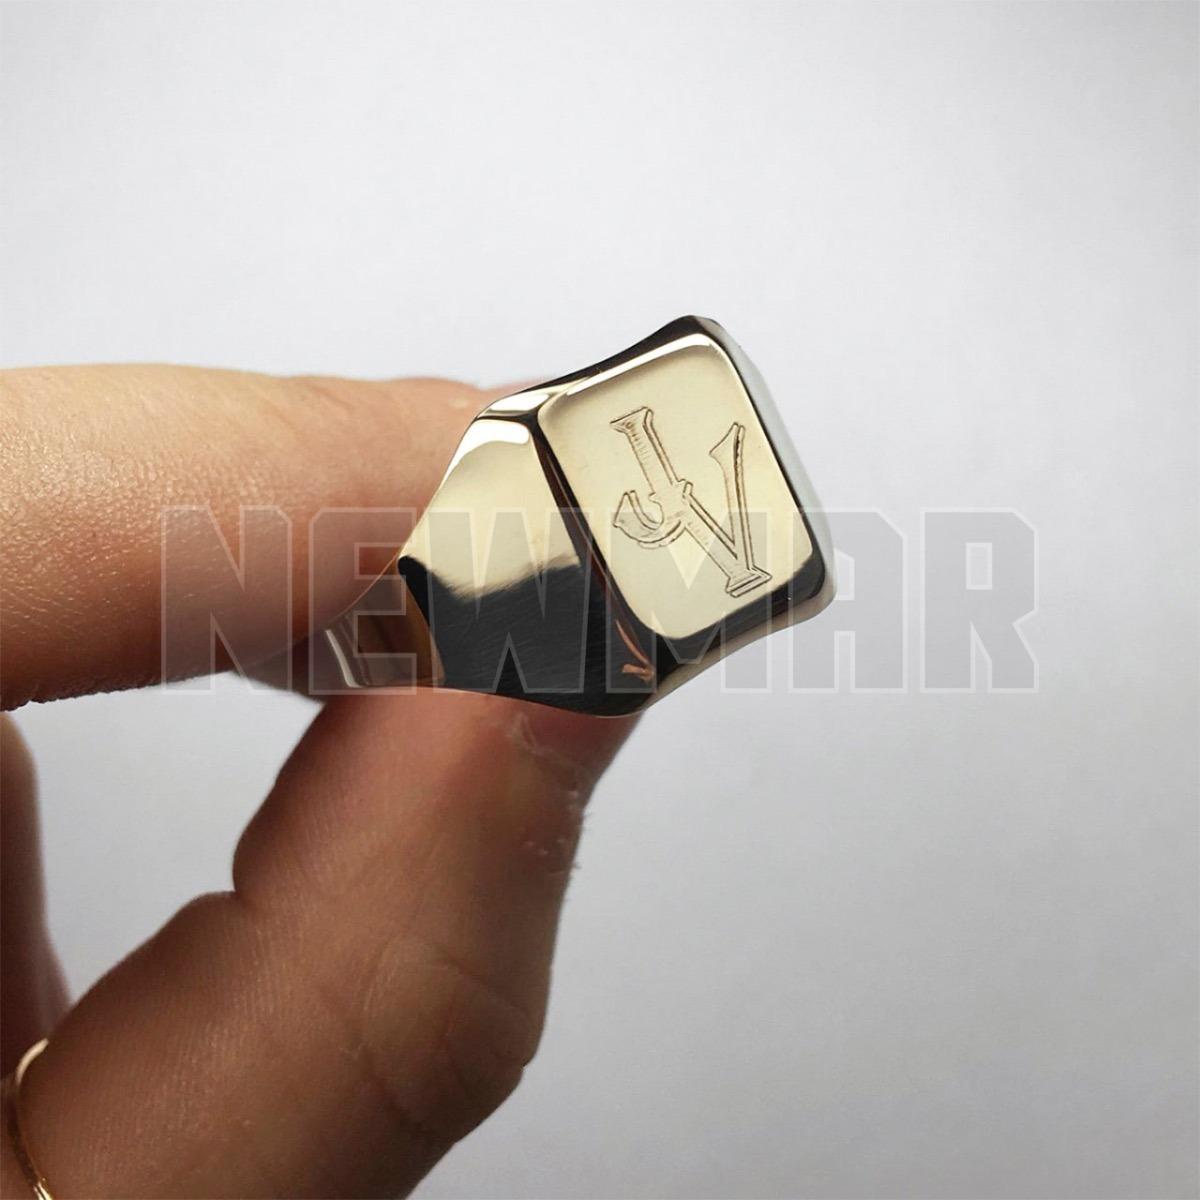 2edf20be72be anillo sello oro 18k cuadrado hombre grabado envio gratis. Cargando zoom.